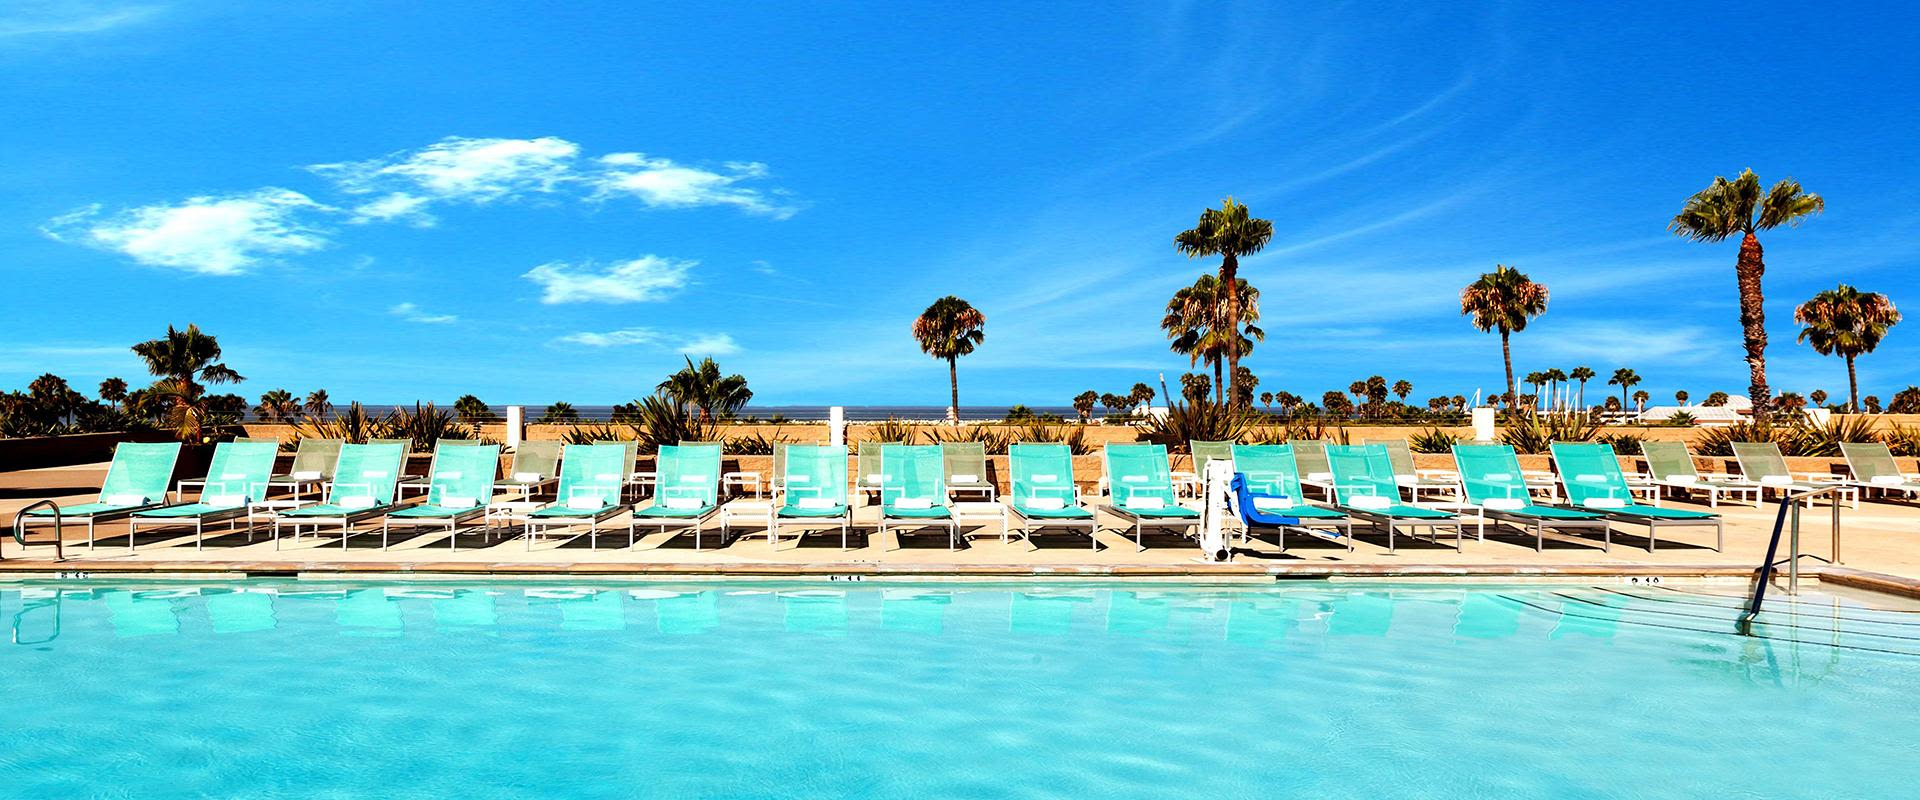 Redondo Beach Outdoor Terrace Pool